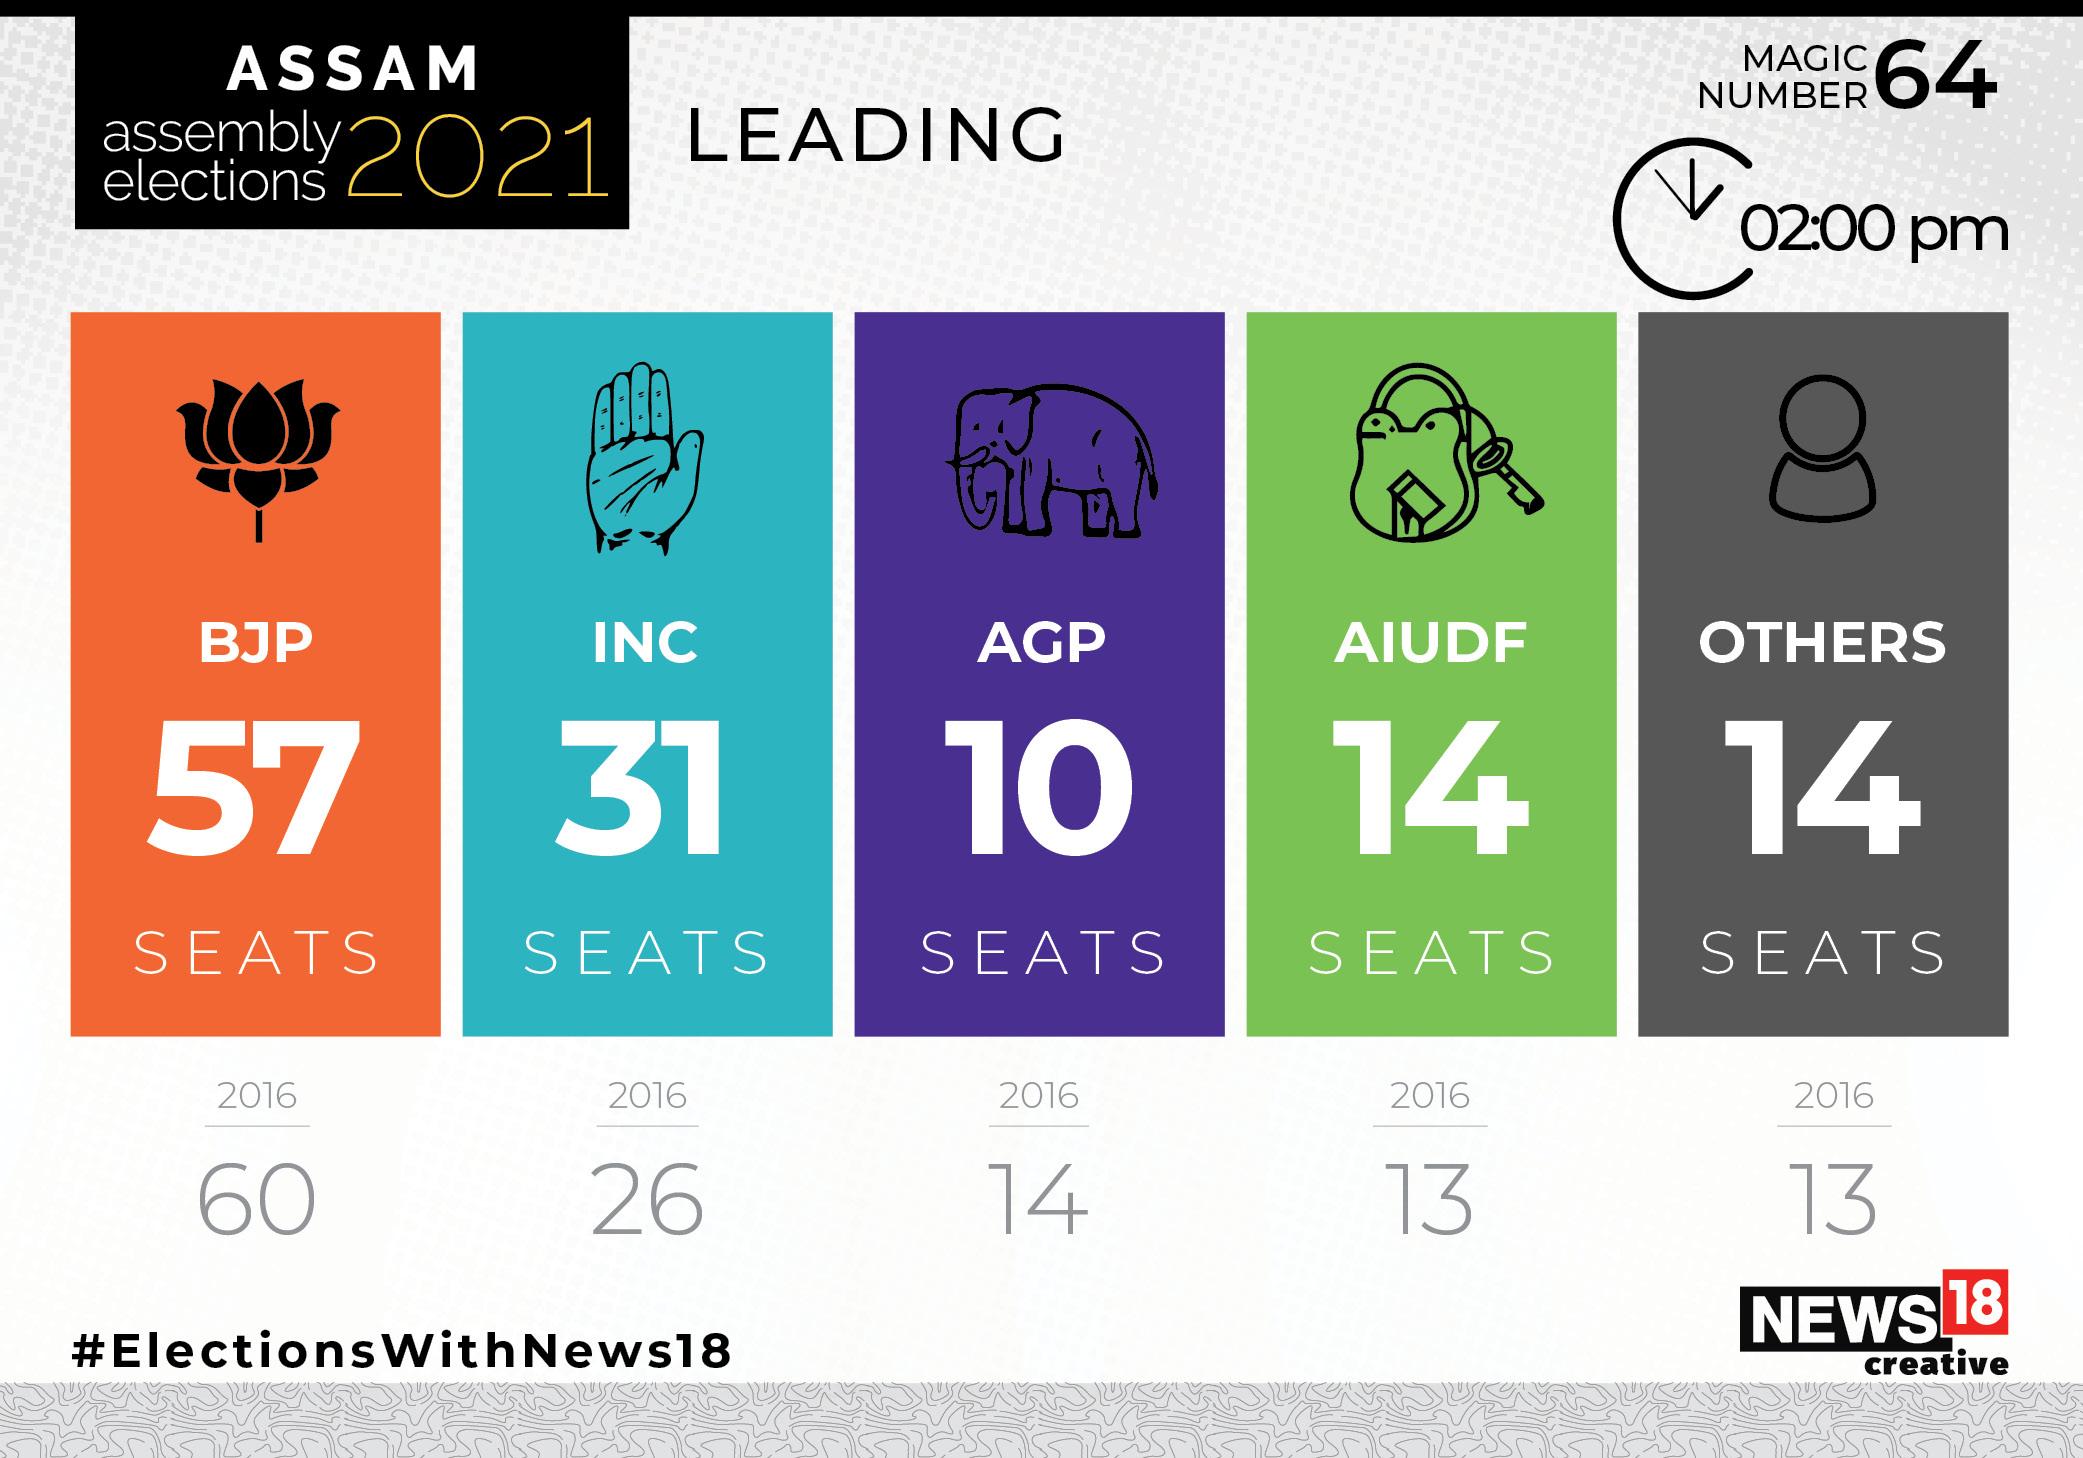 Assam Election Results 2021 HIGHLIGHTS: BJP-led alliance set to form govt; All eyes on CM selection